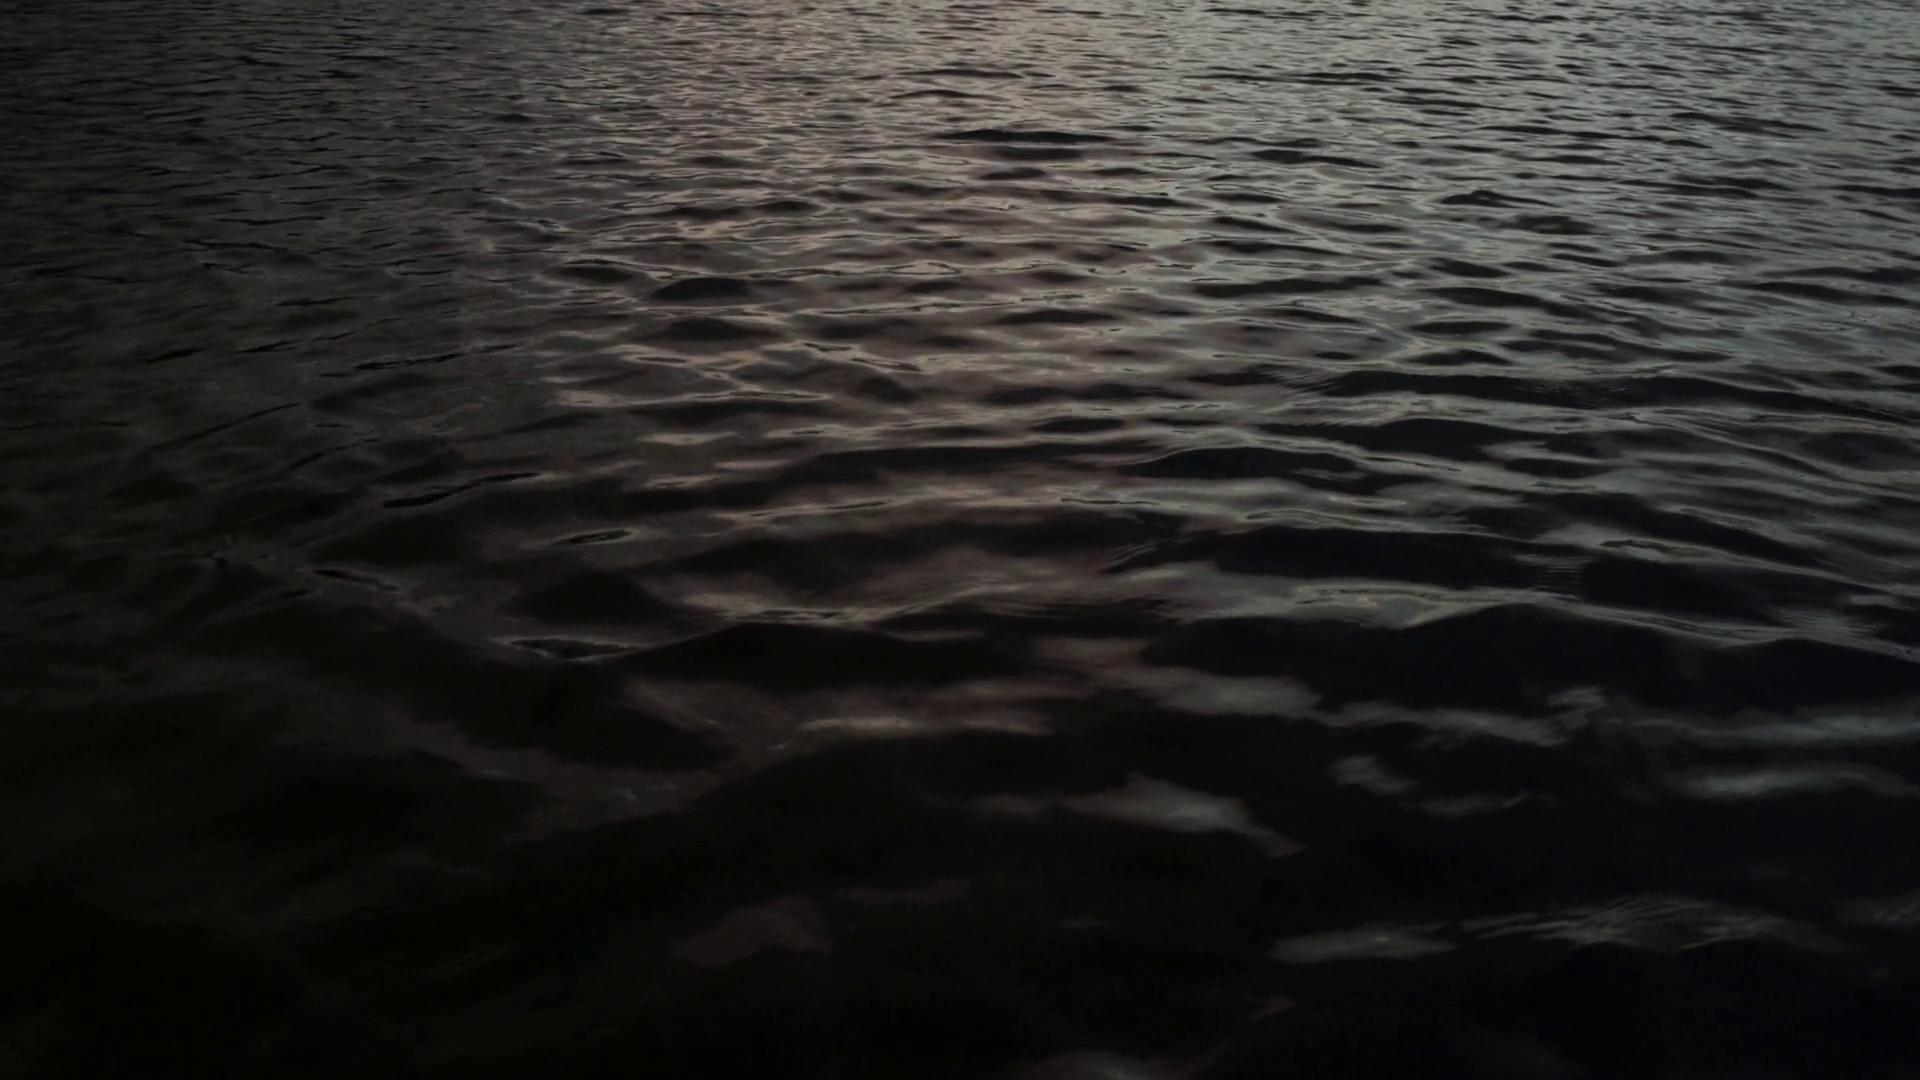 Dark Water Ripples, Beautiful Yet Ominous (Slow Motion) Stock Video ...